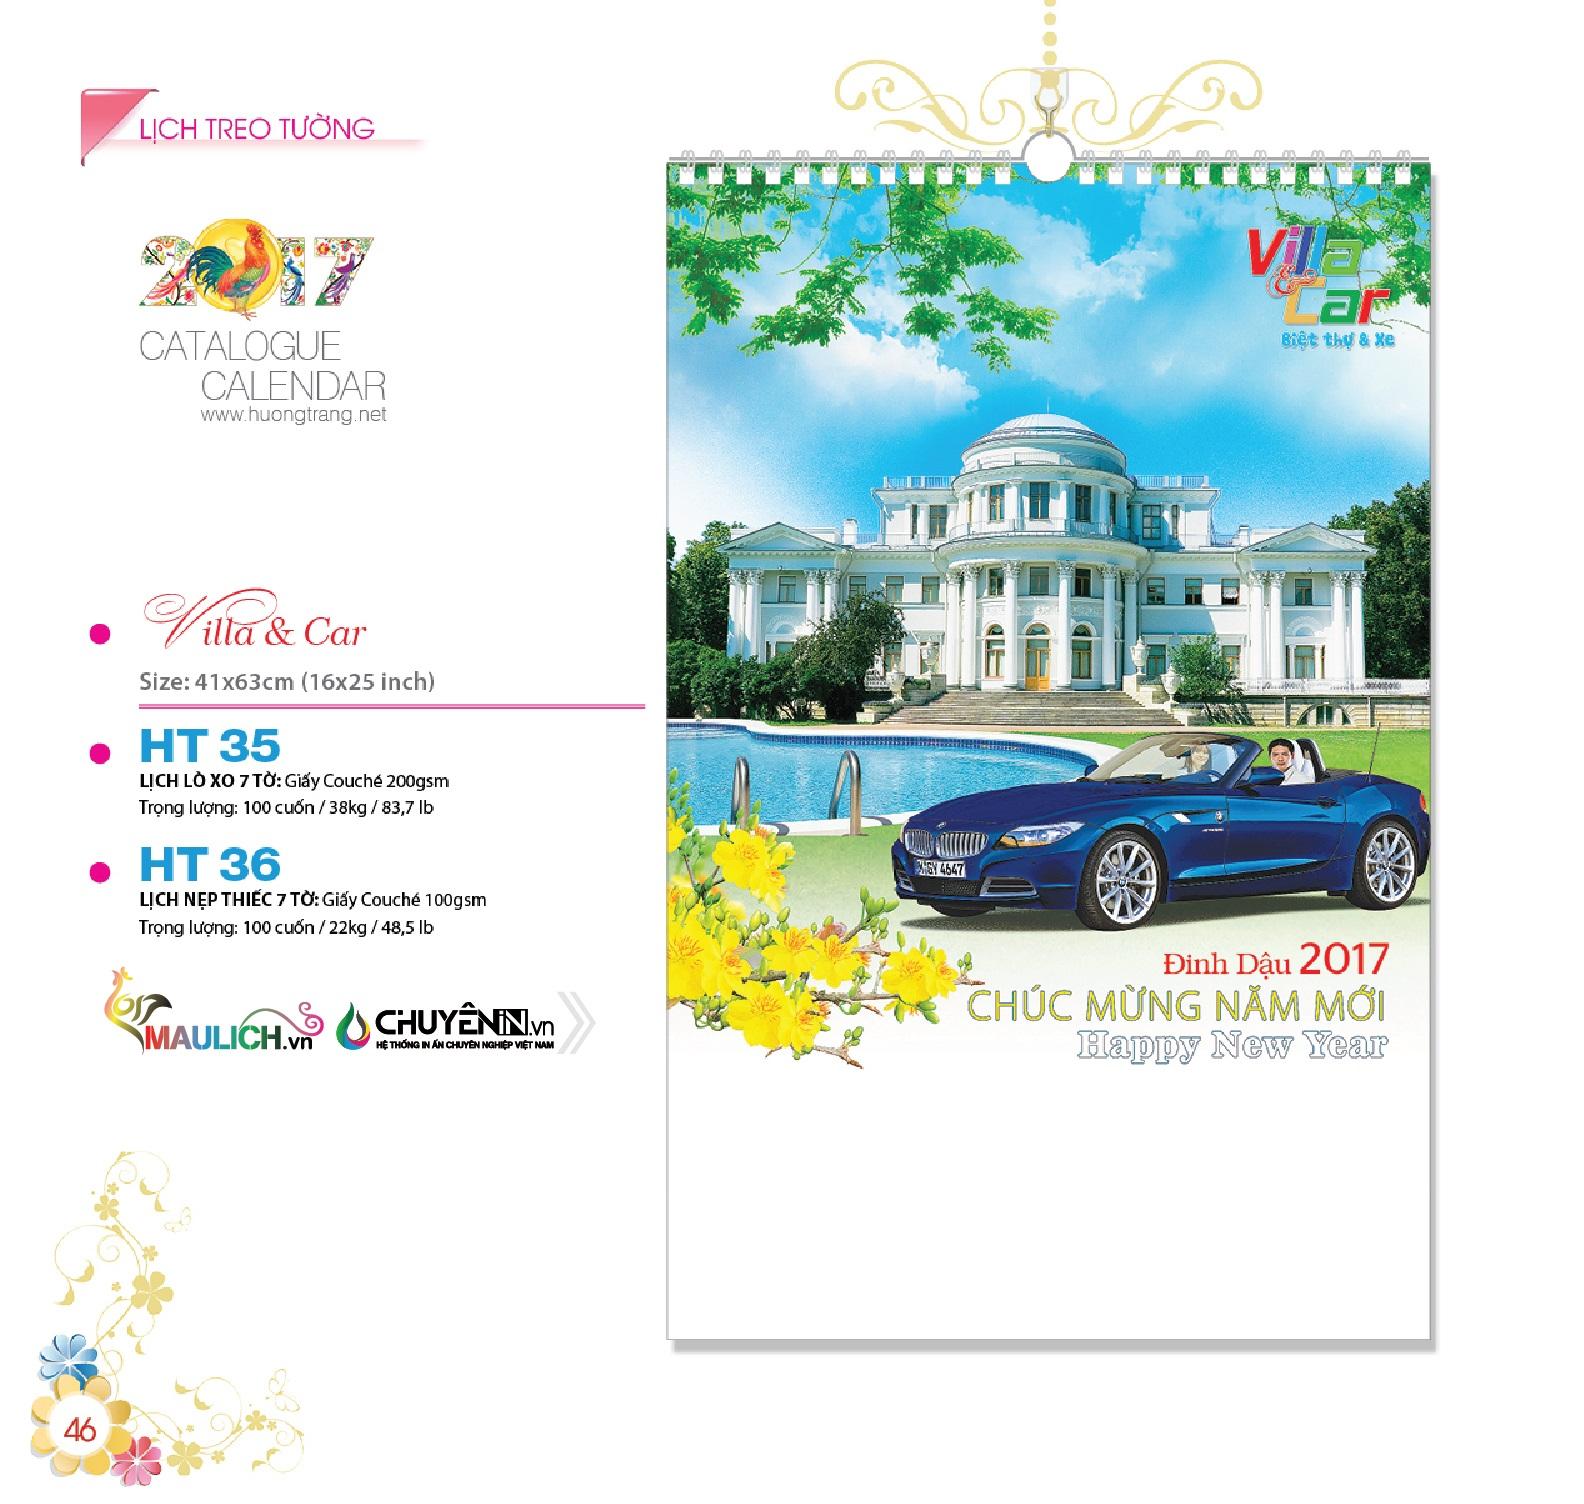 HT-36: Lịch treo tường nẹp thiết (7 tờ) - Villa & Car